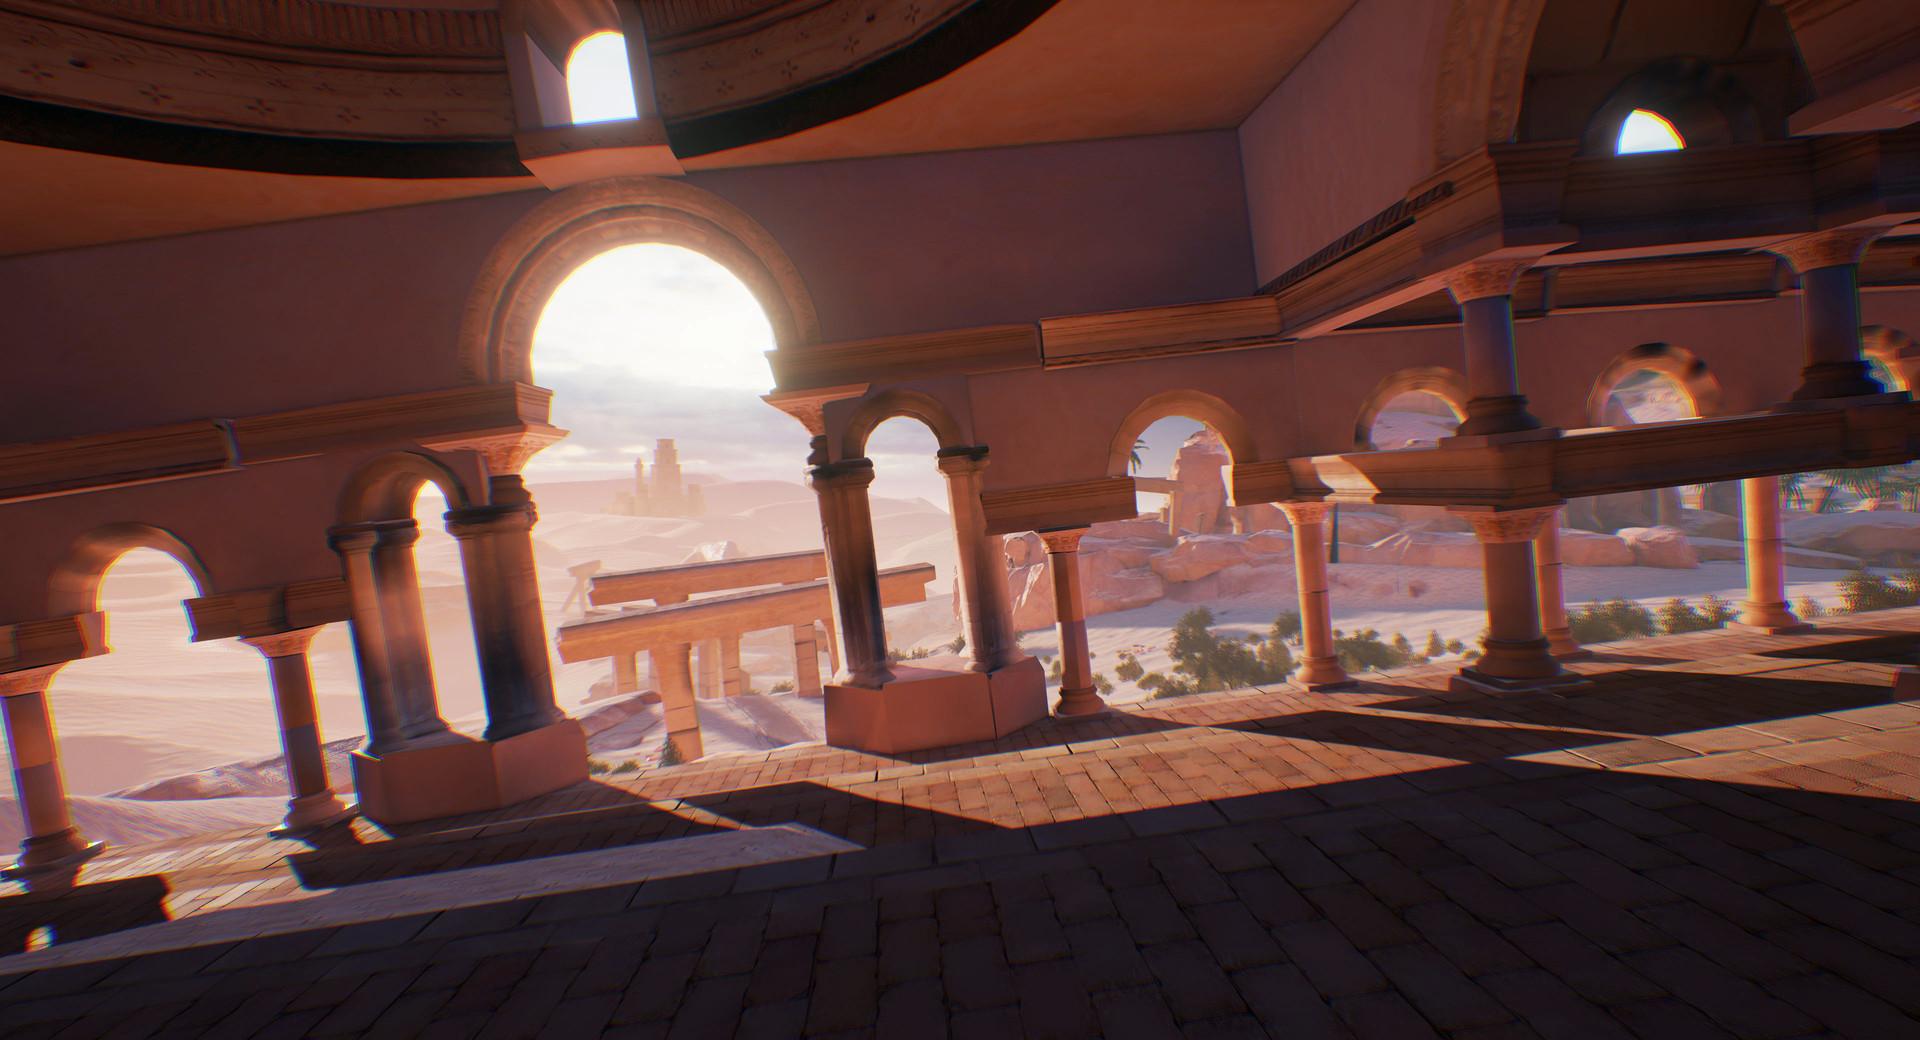 Florian thomasset desert temple 6